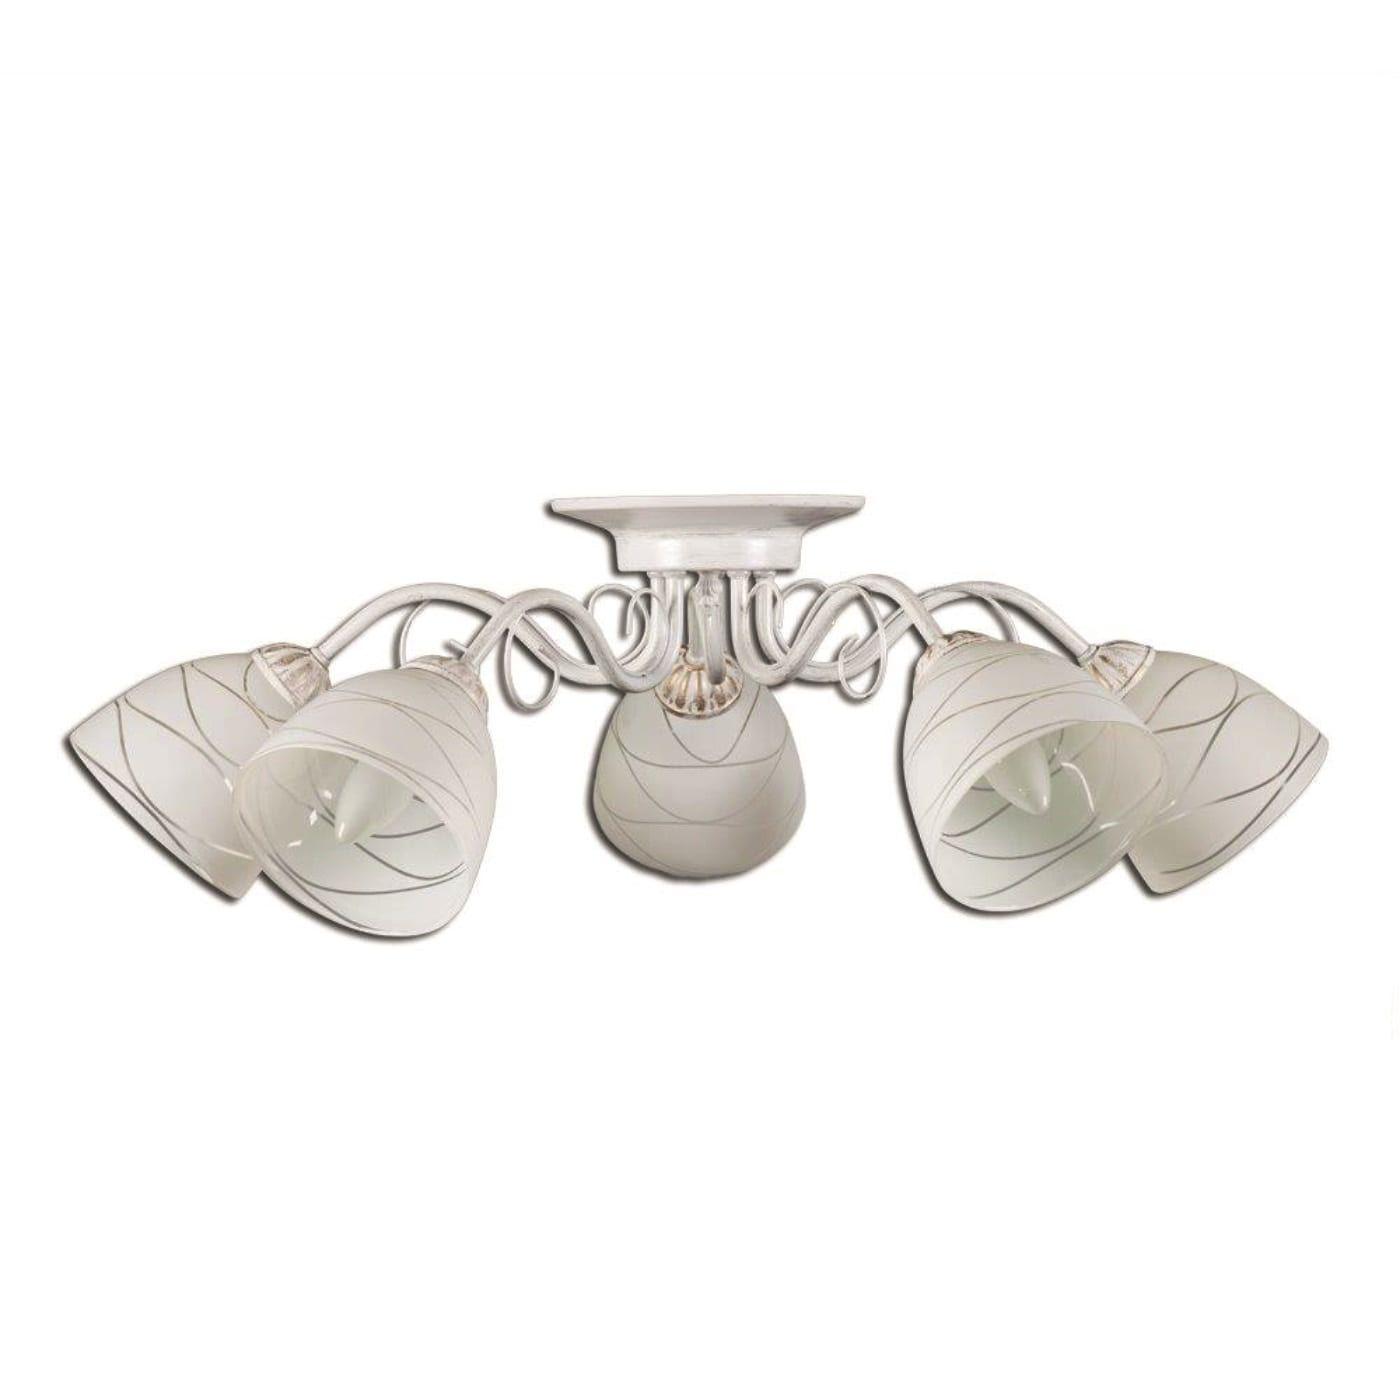 PETRASVET / Ceiling chandelier S2124-5, 5xE27 max. 60W